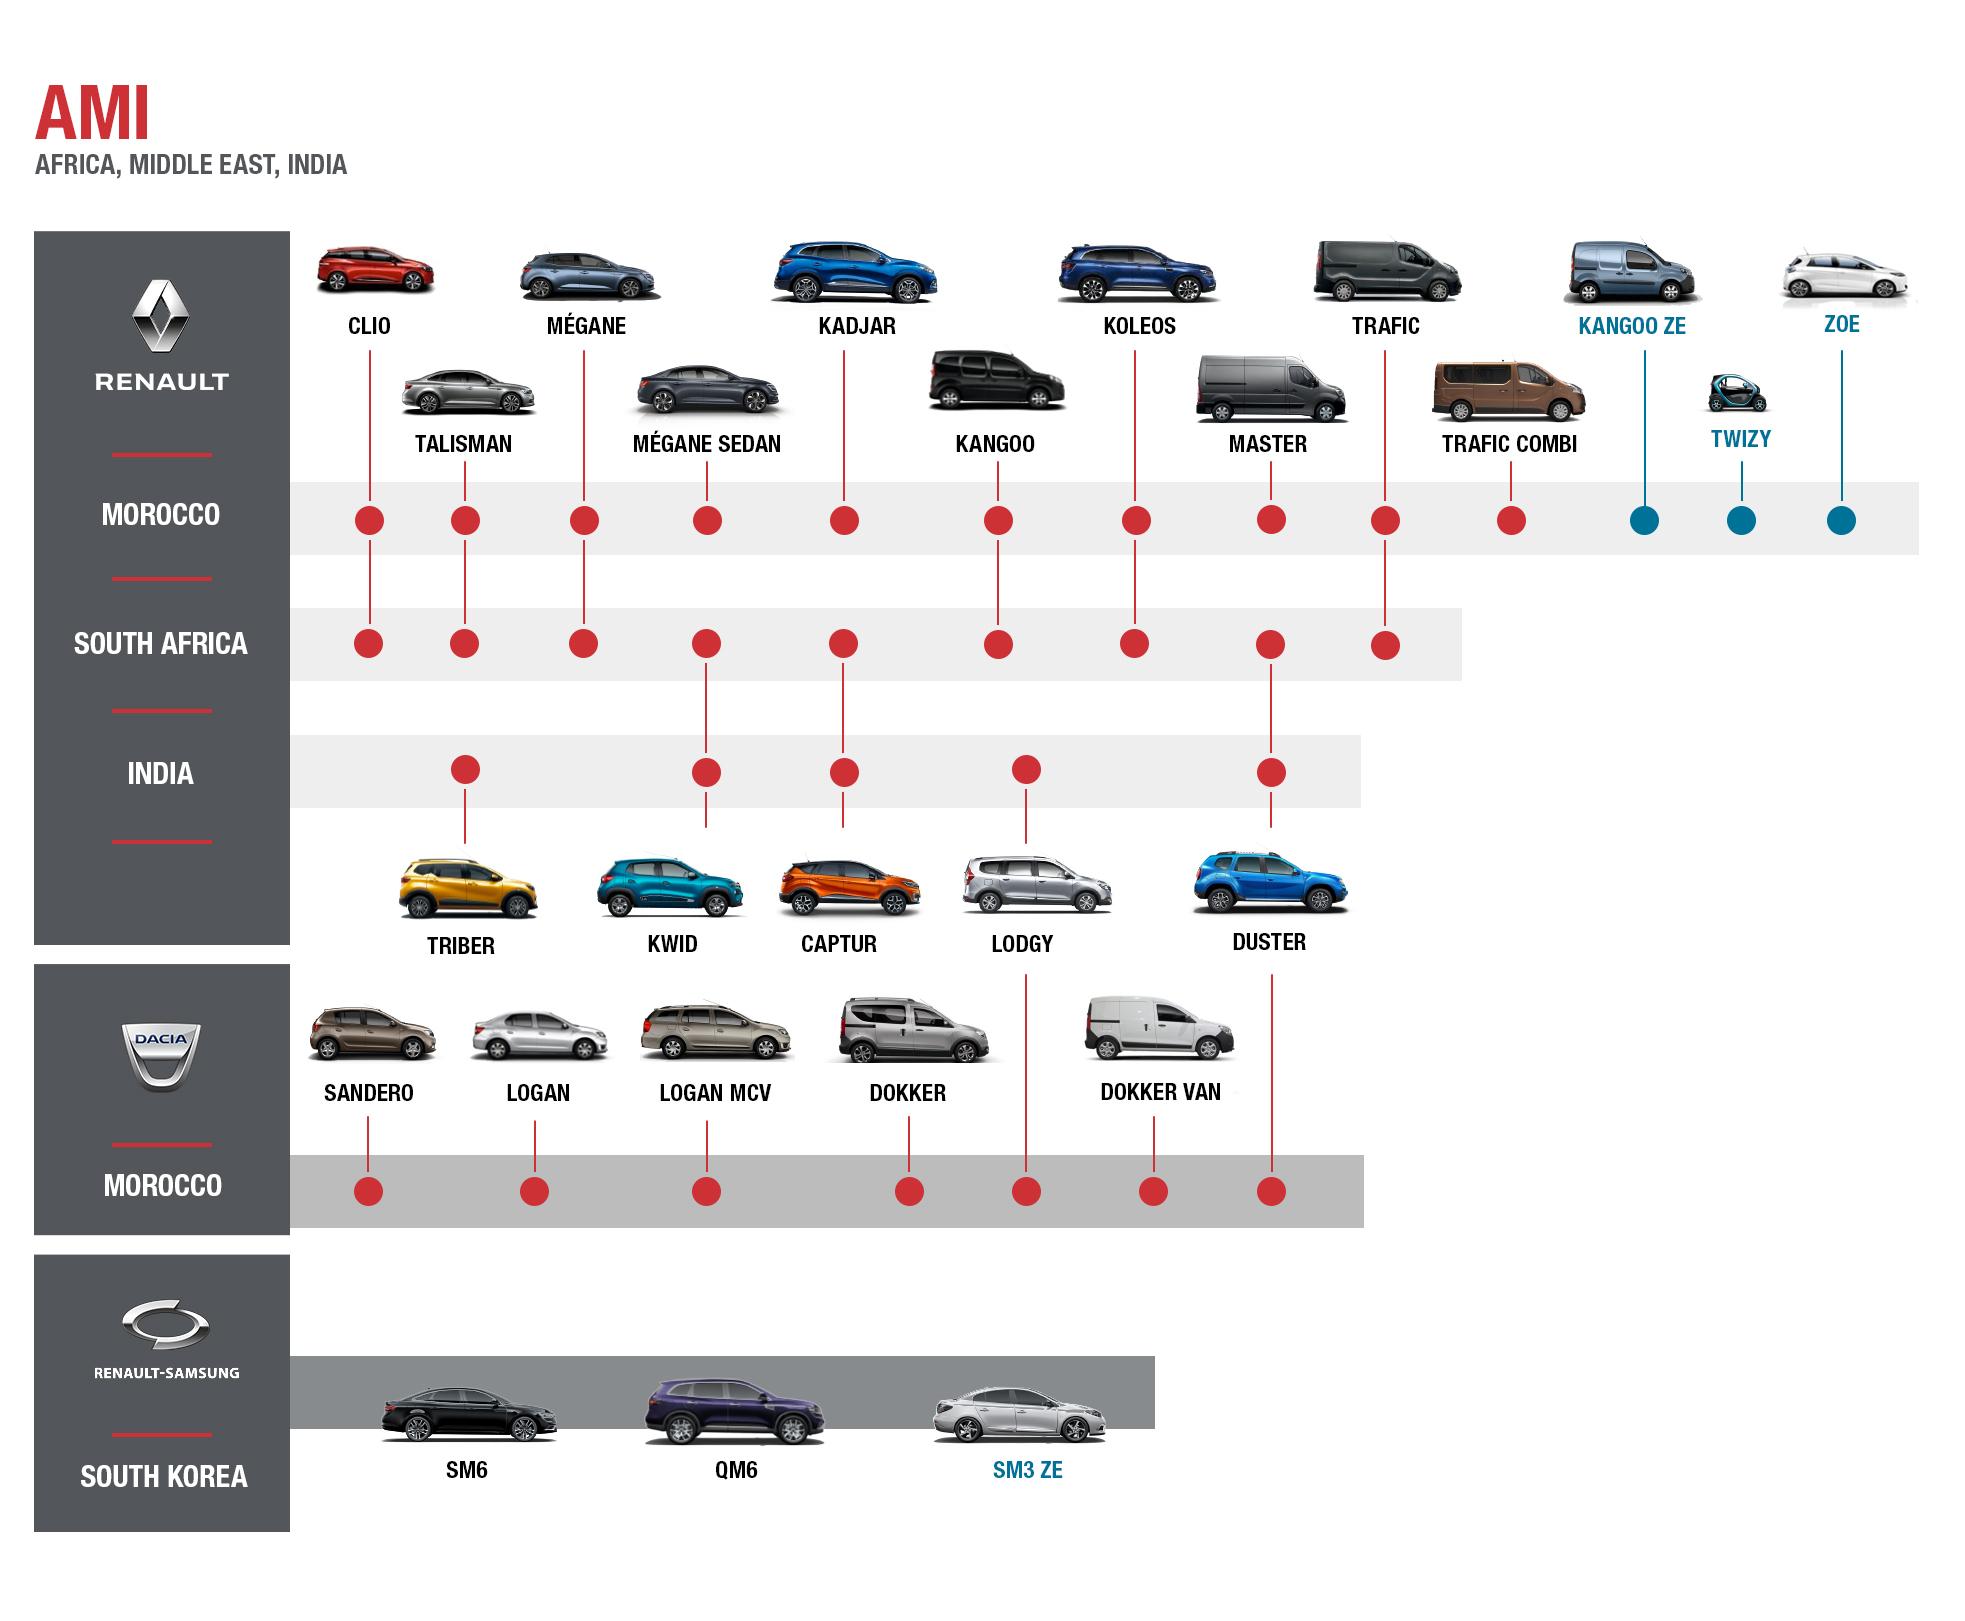 Renault fleet customer solutions véhicules AMI 2